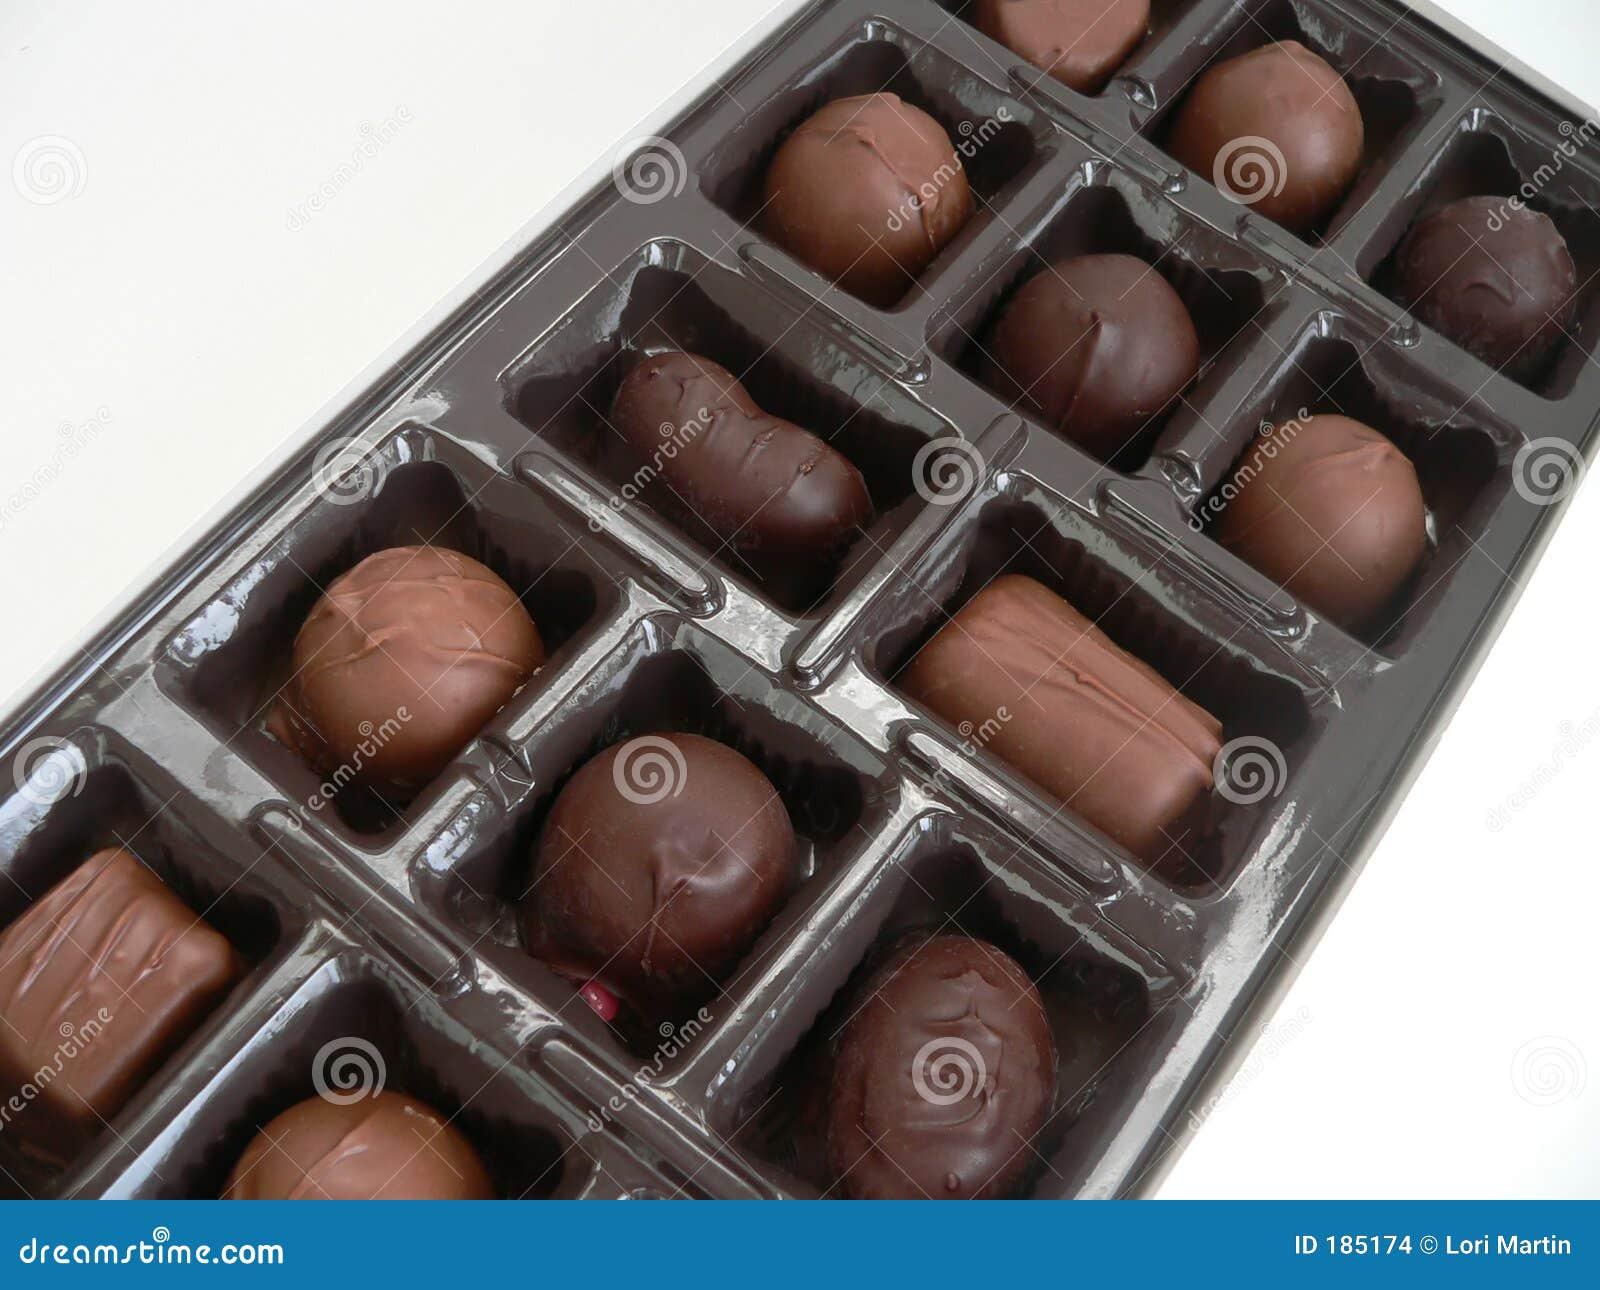 Download 巧克力 库存照片. 图片 包括有 巧克力, 卡路里, 糖果, 礼品, 肥胖, 健康, 饮食, 华伦泰, 糖尿病 - 185174